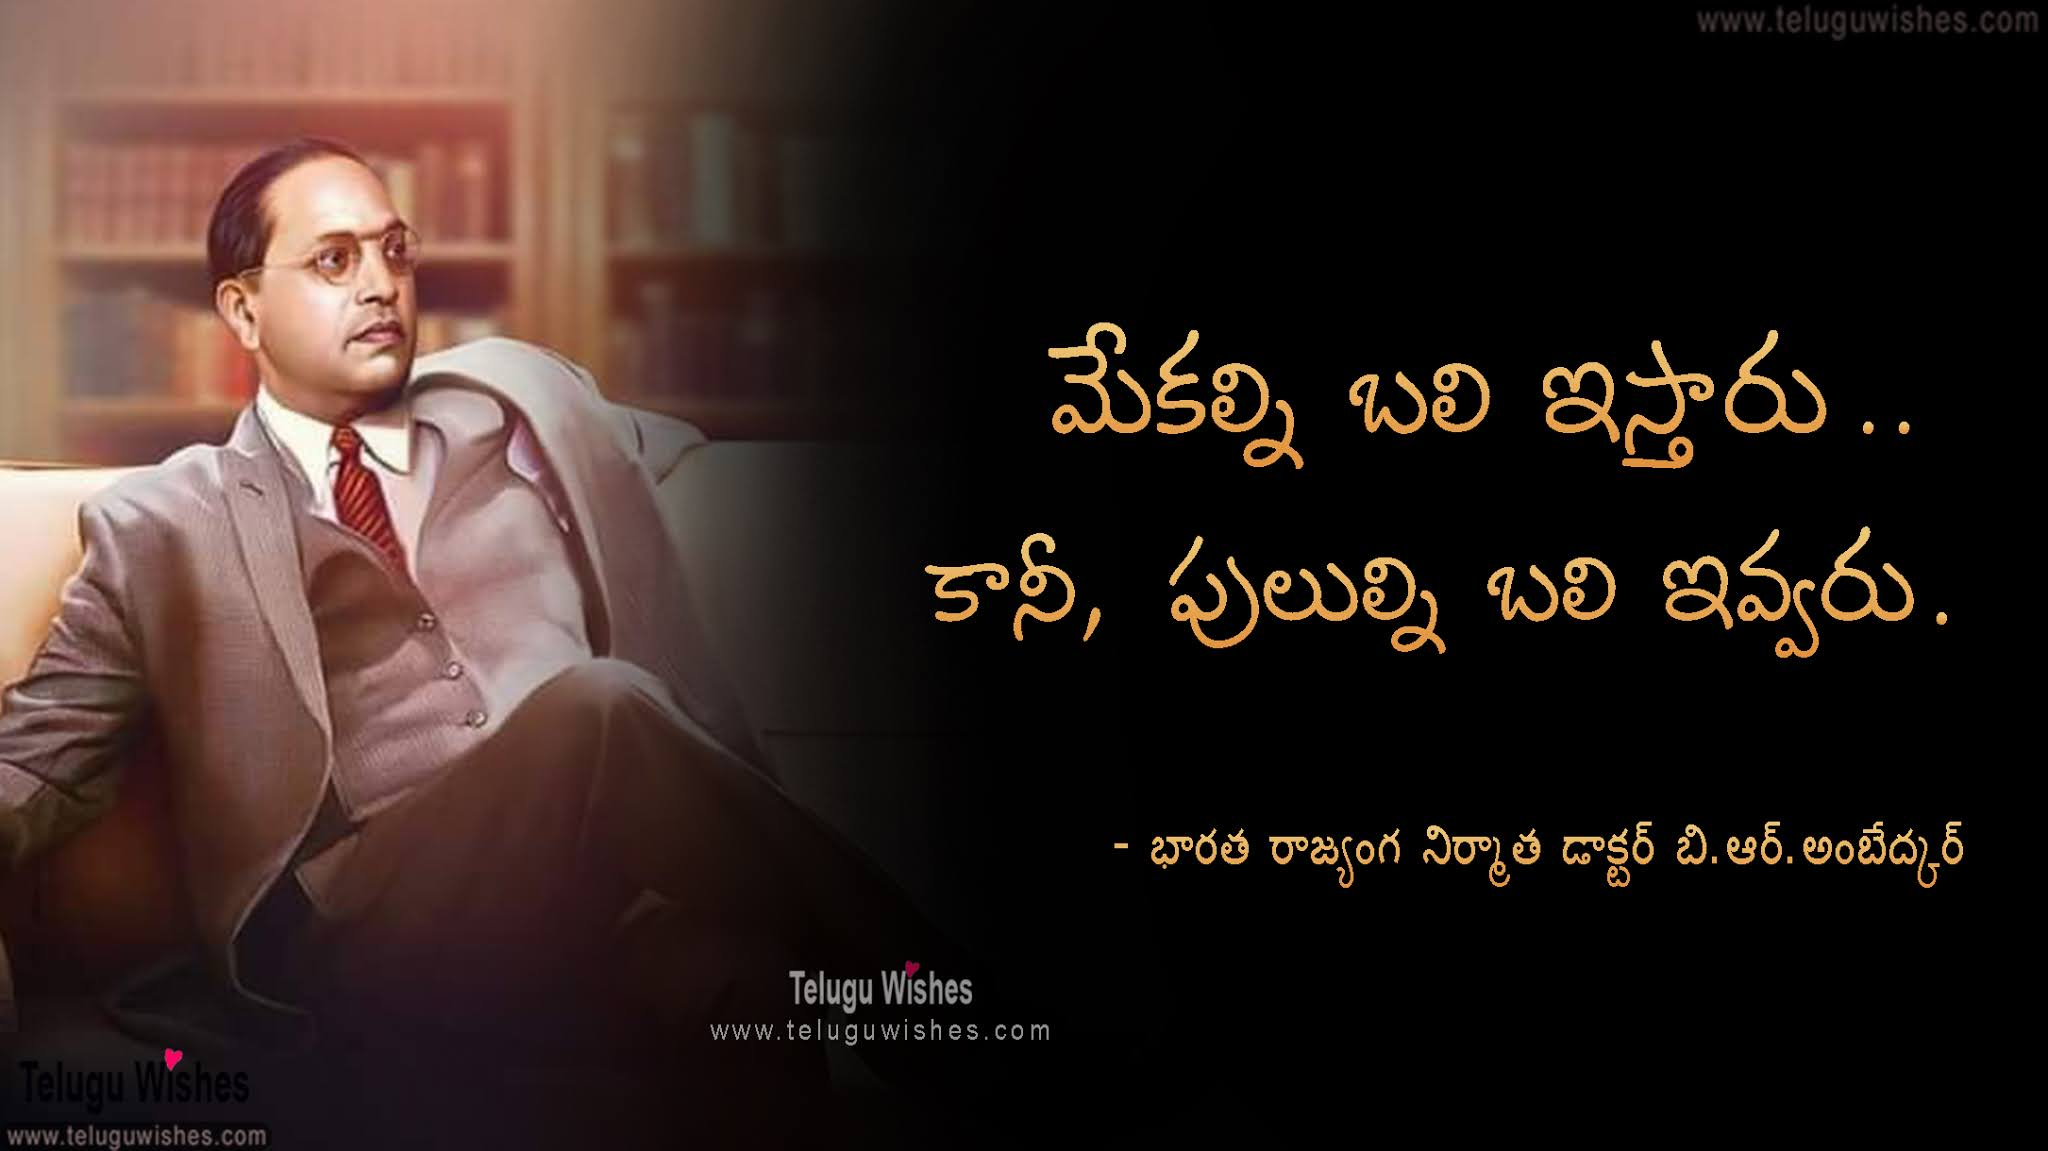 Ambedkar quotes in Telugu